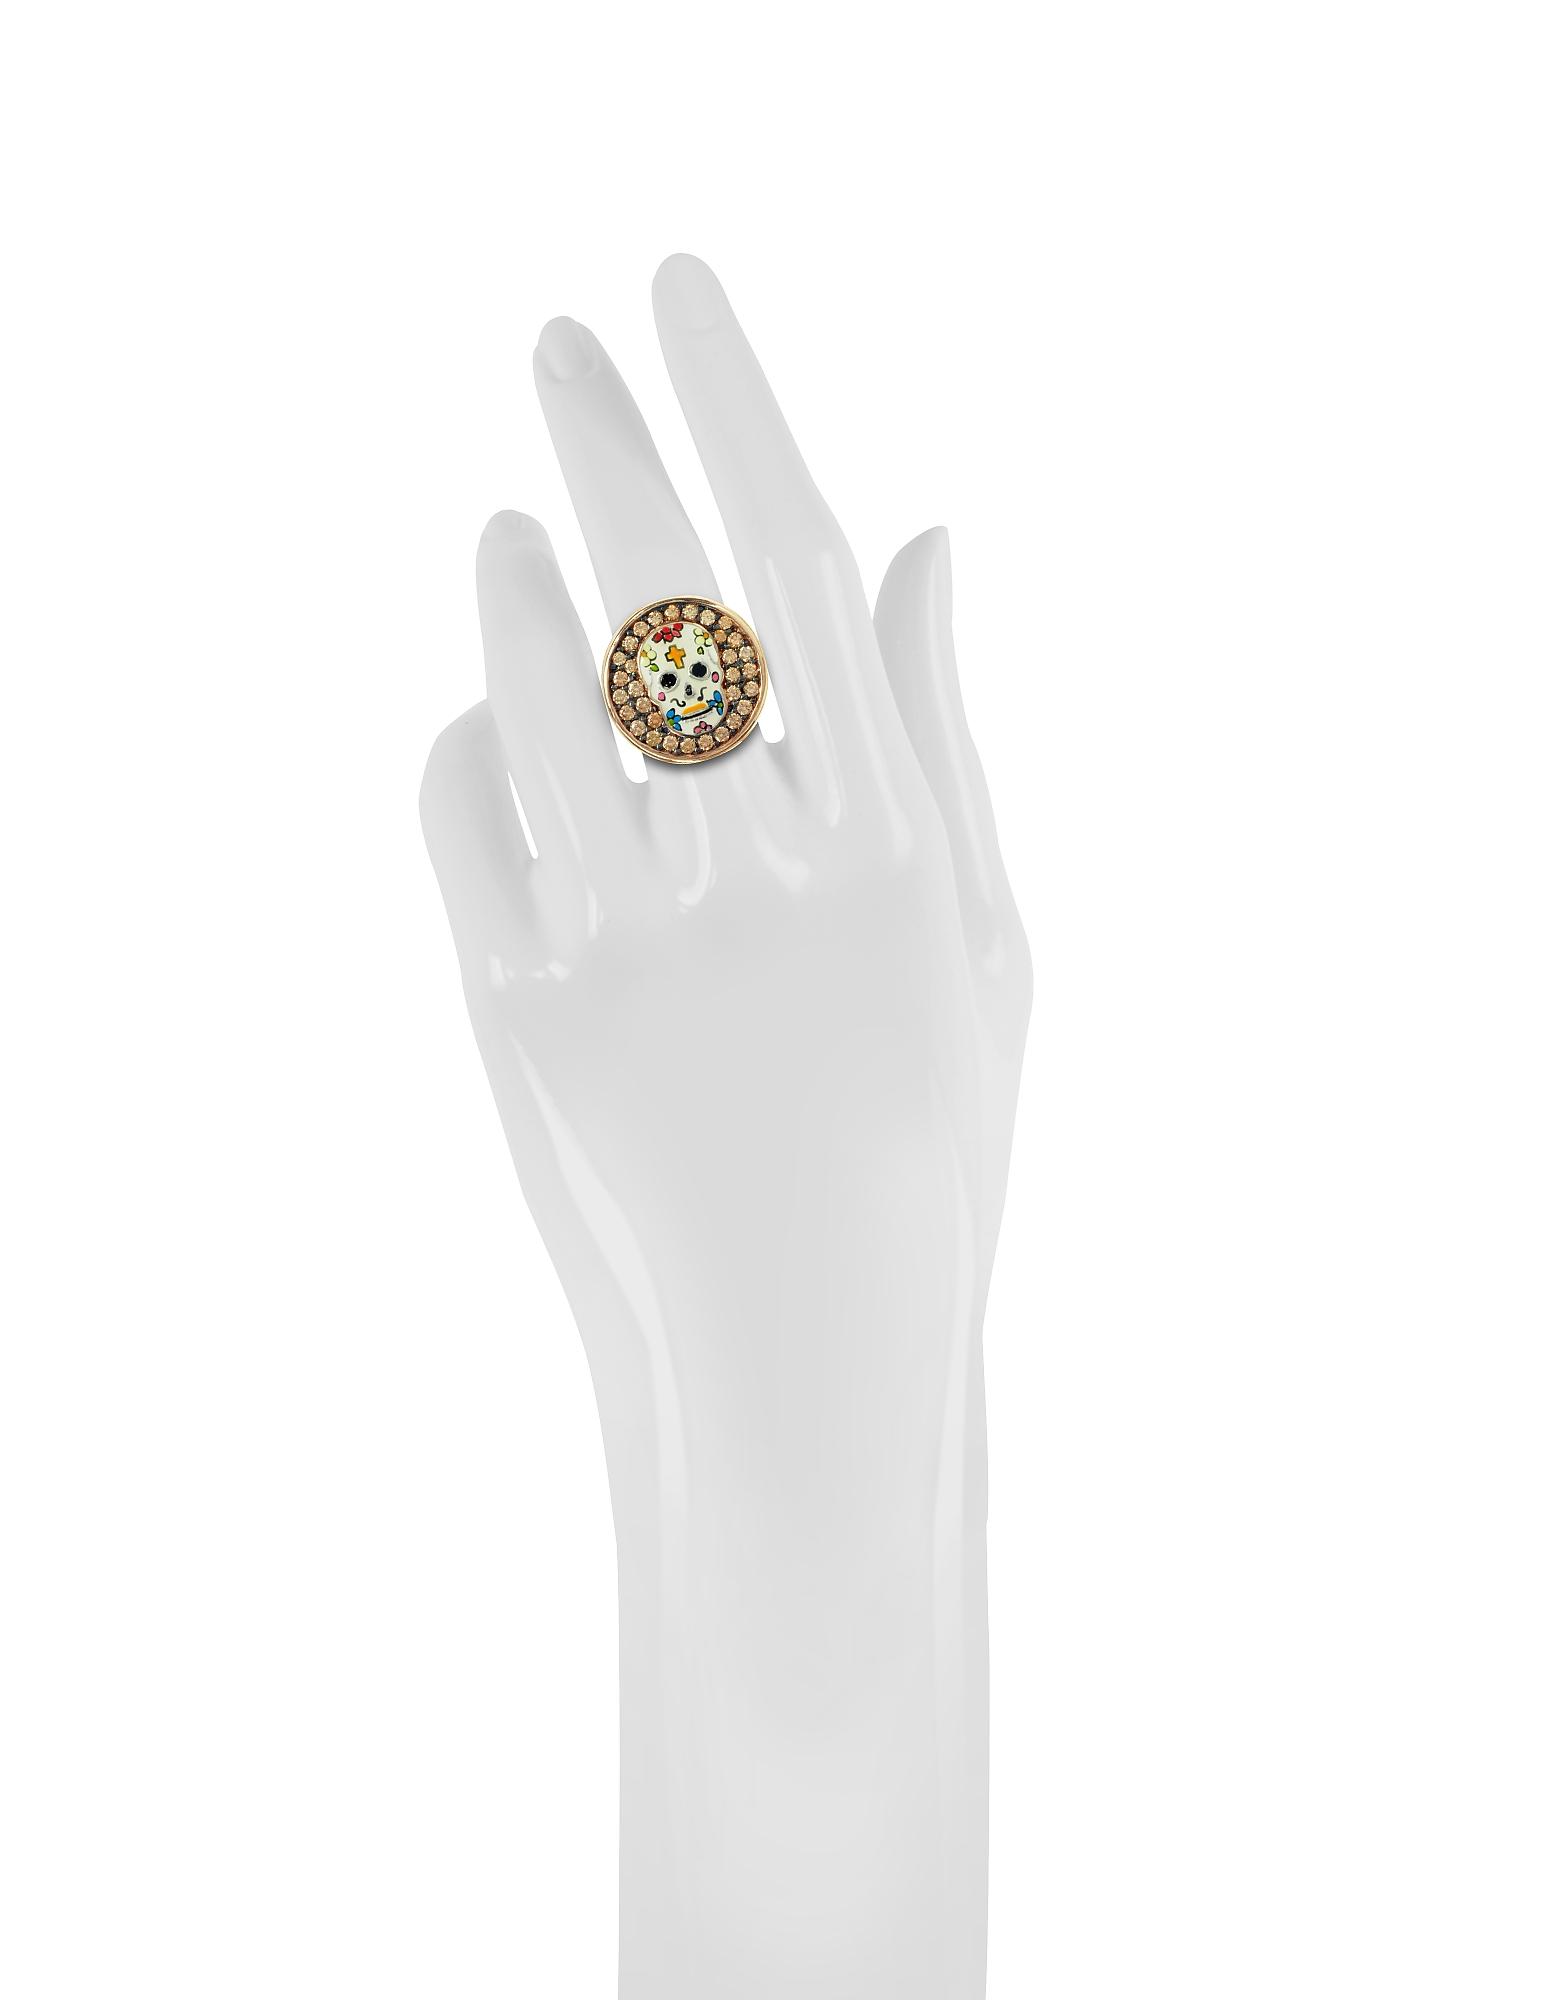 Calavera Skull Rhodium Plated Sterling Silver Adjustable Ring w/Cubic Zirconia от Forzieri.com INT